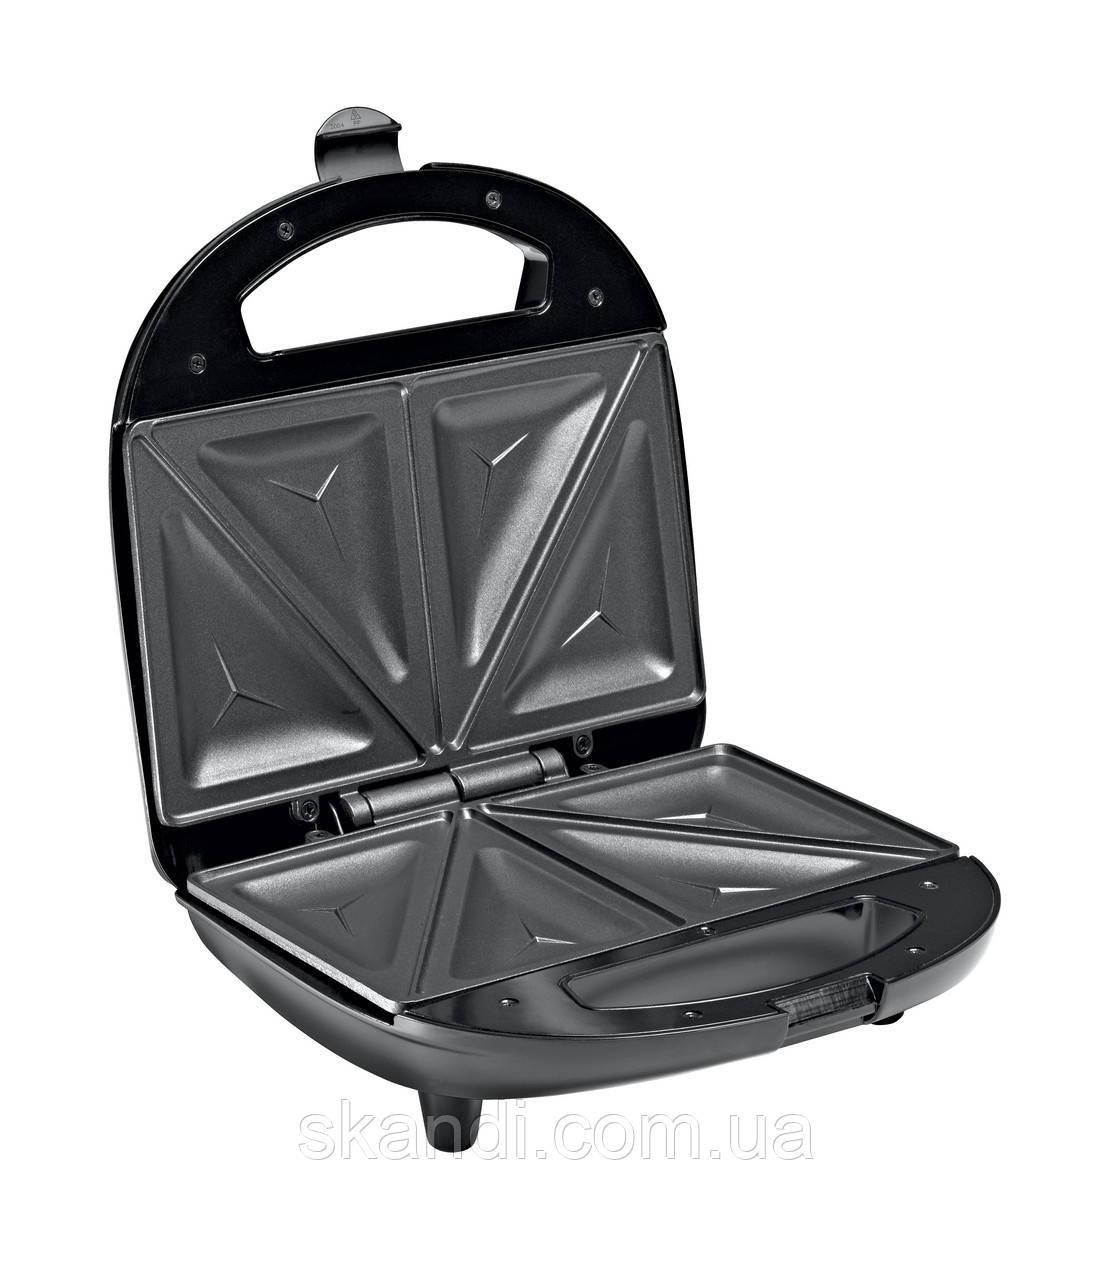 Бутербродница Concept Premium (Оригинал) Чехия SV-3030